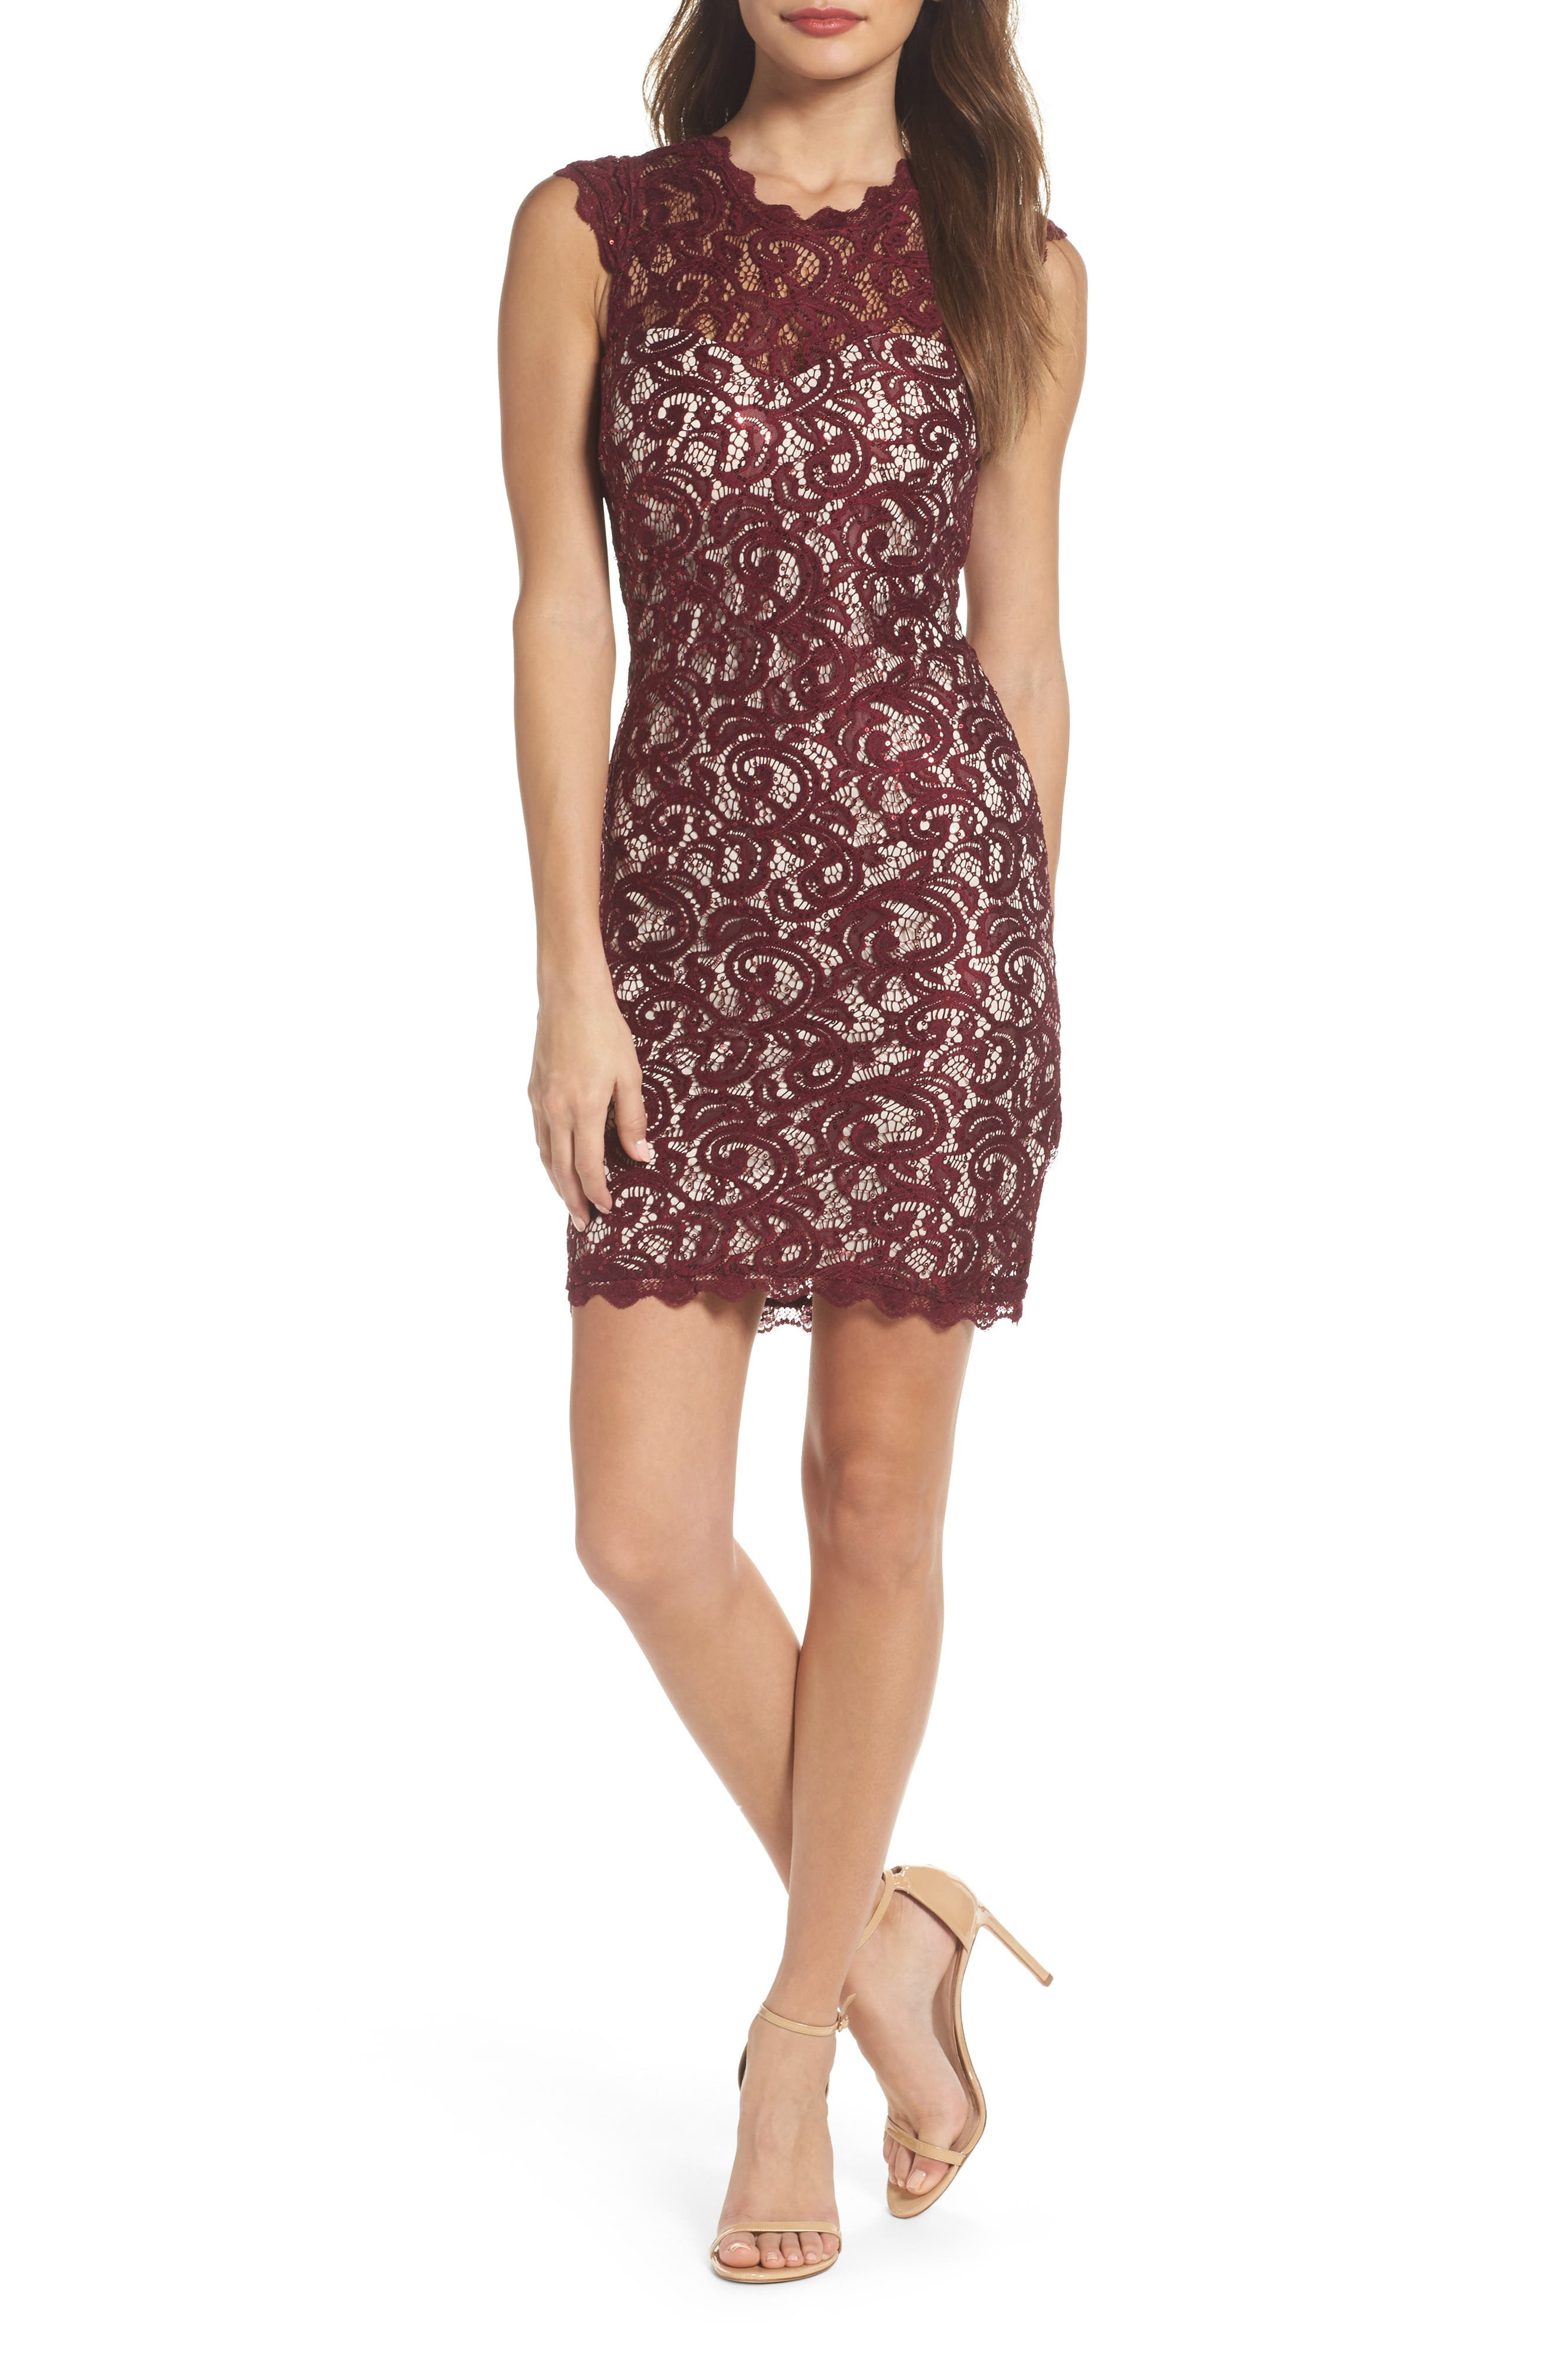 Sequin Hearts Sequin Lace Body-Con Dress